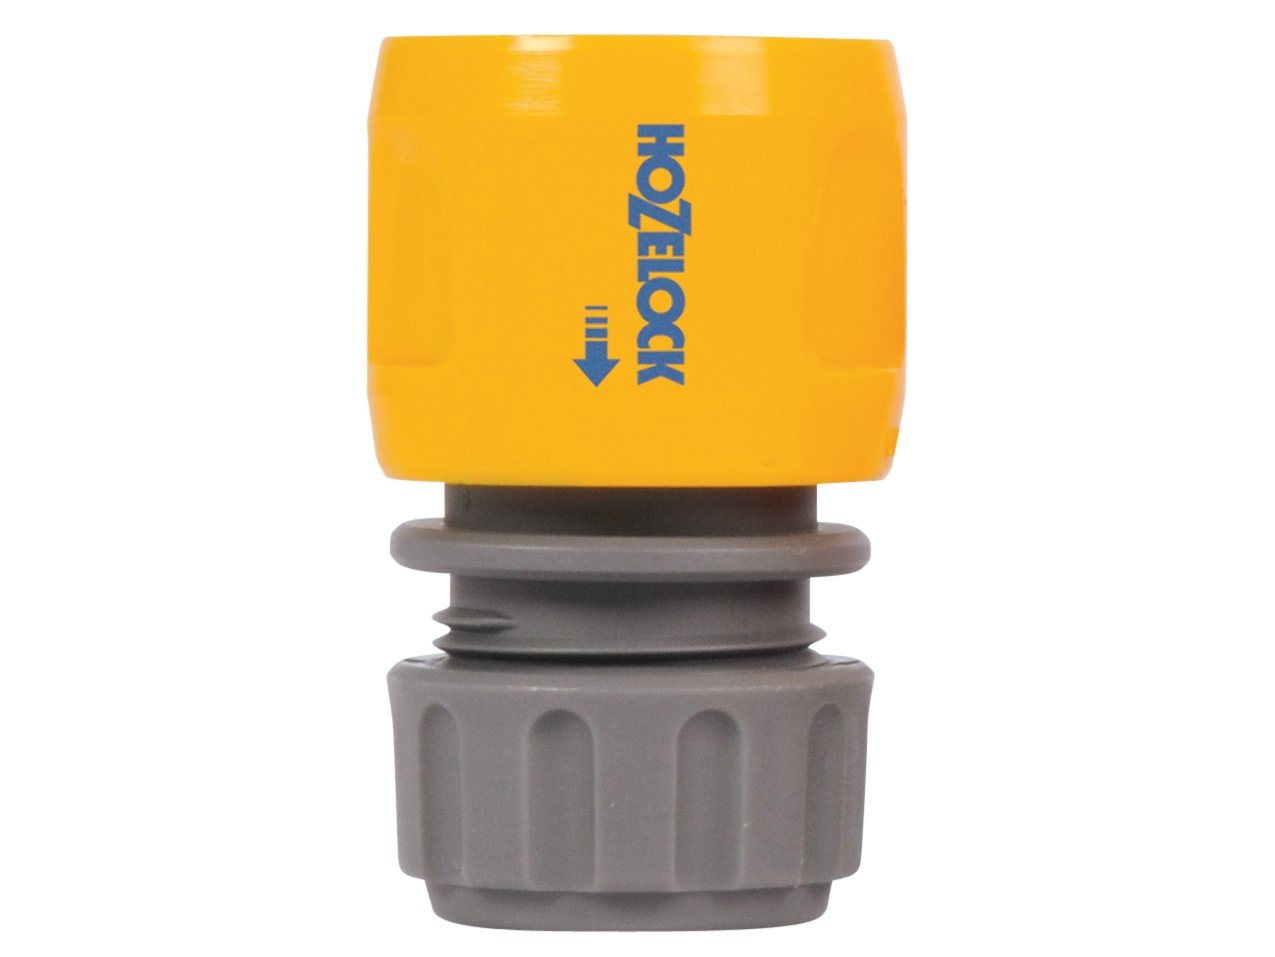 Hozelock Hose end connector (12.5mm & 15mm) – £1.85